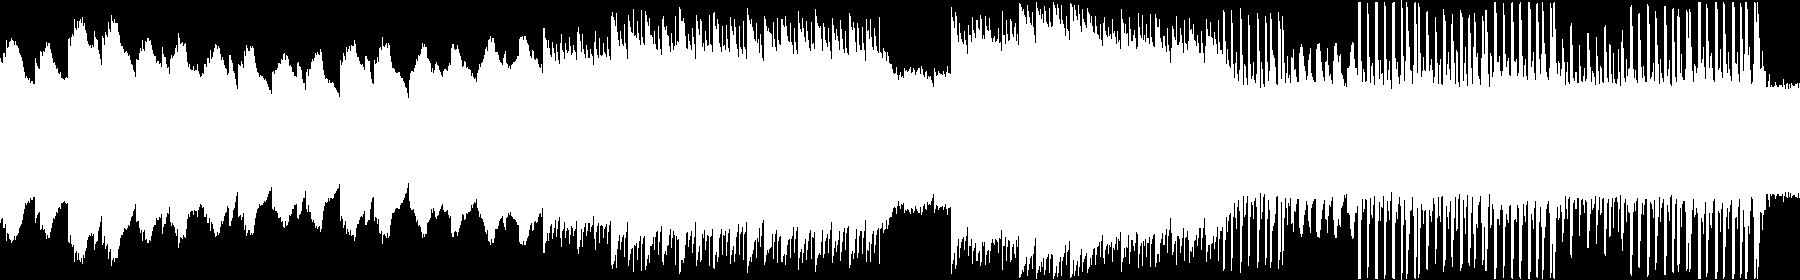 HYPERCOLOR - RC-20 Presets audio waveform